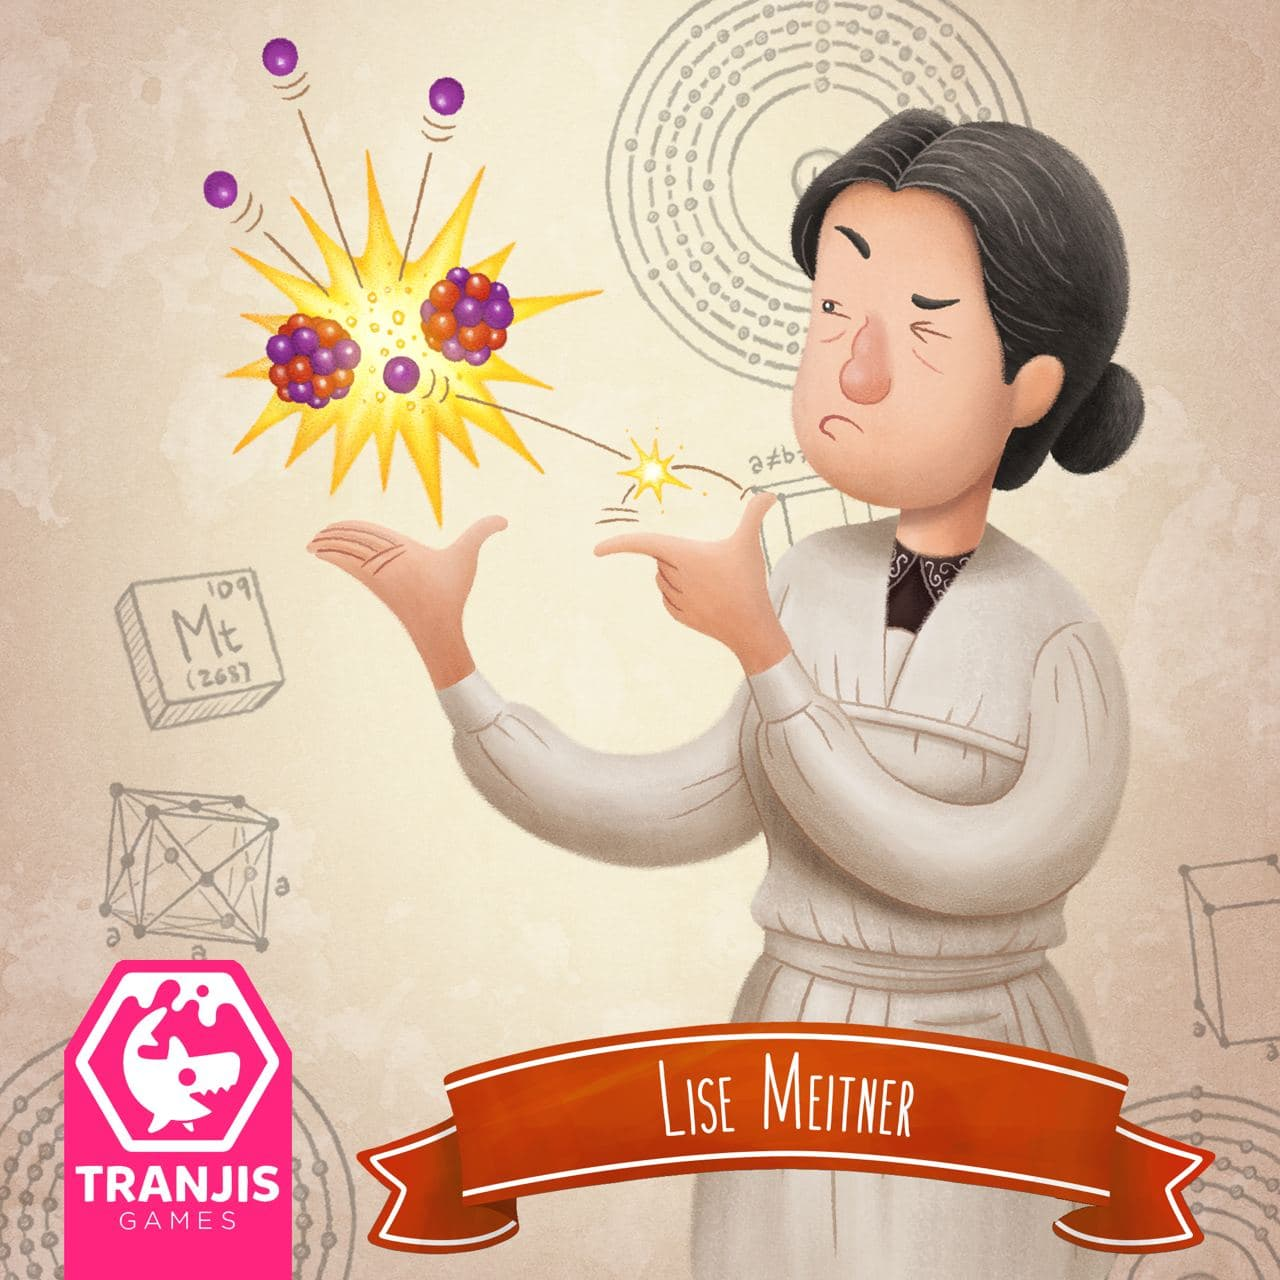 científica Nobel Run juego Tranjis Games